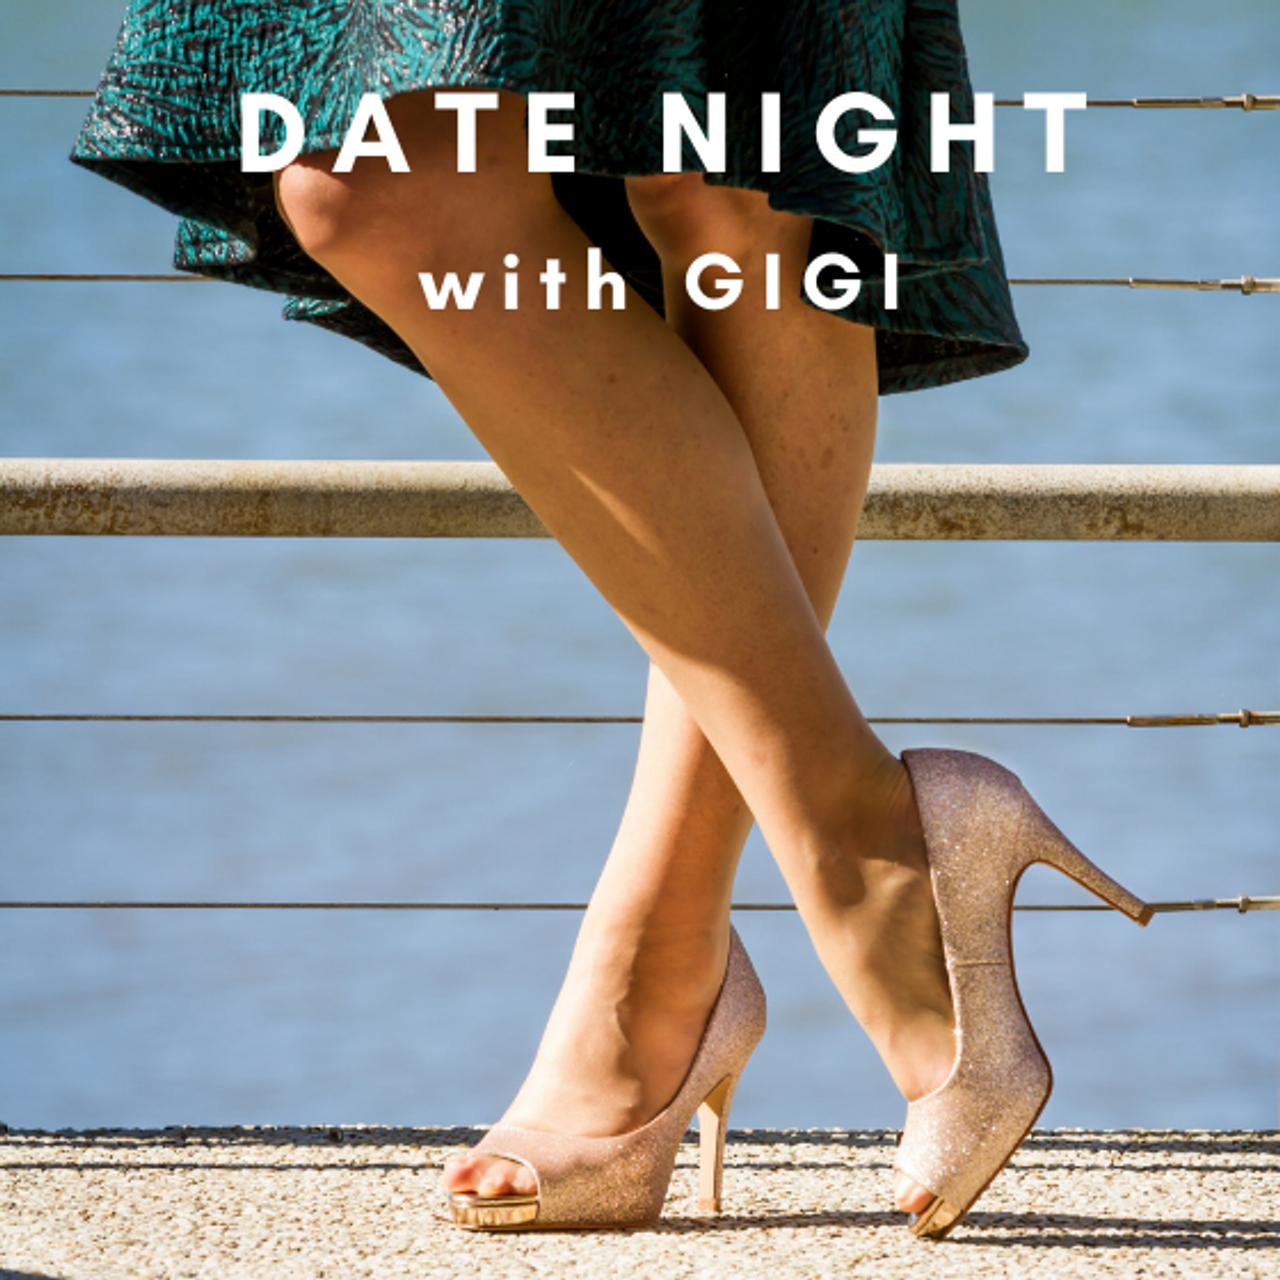 DATE NIGHT WITH GIGI